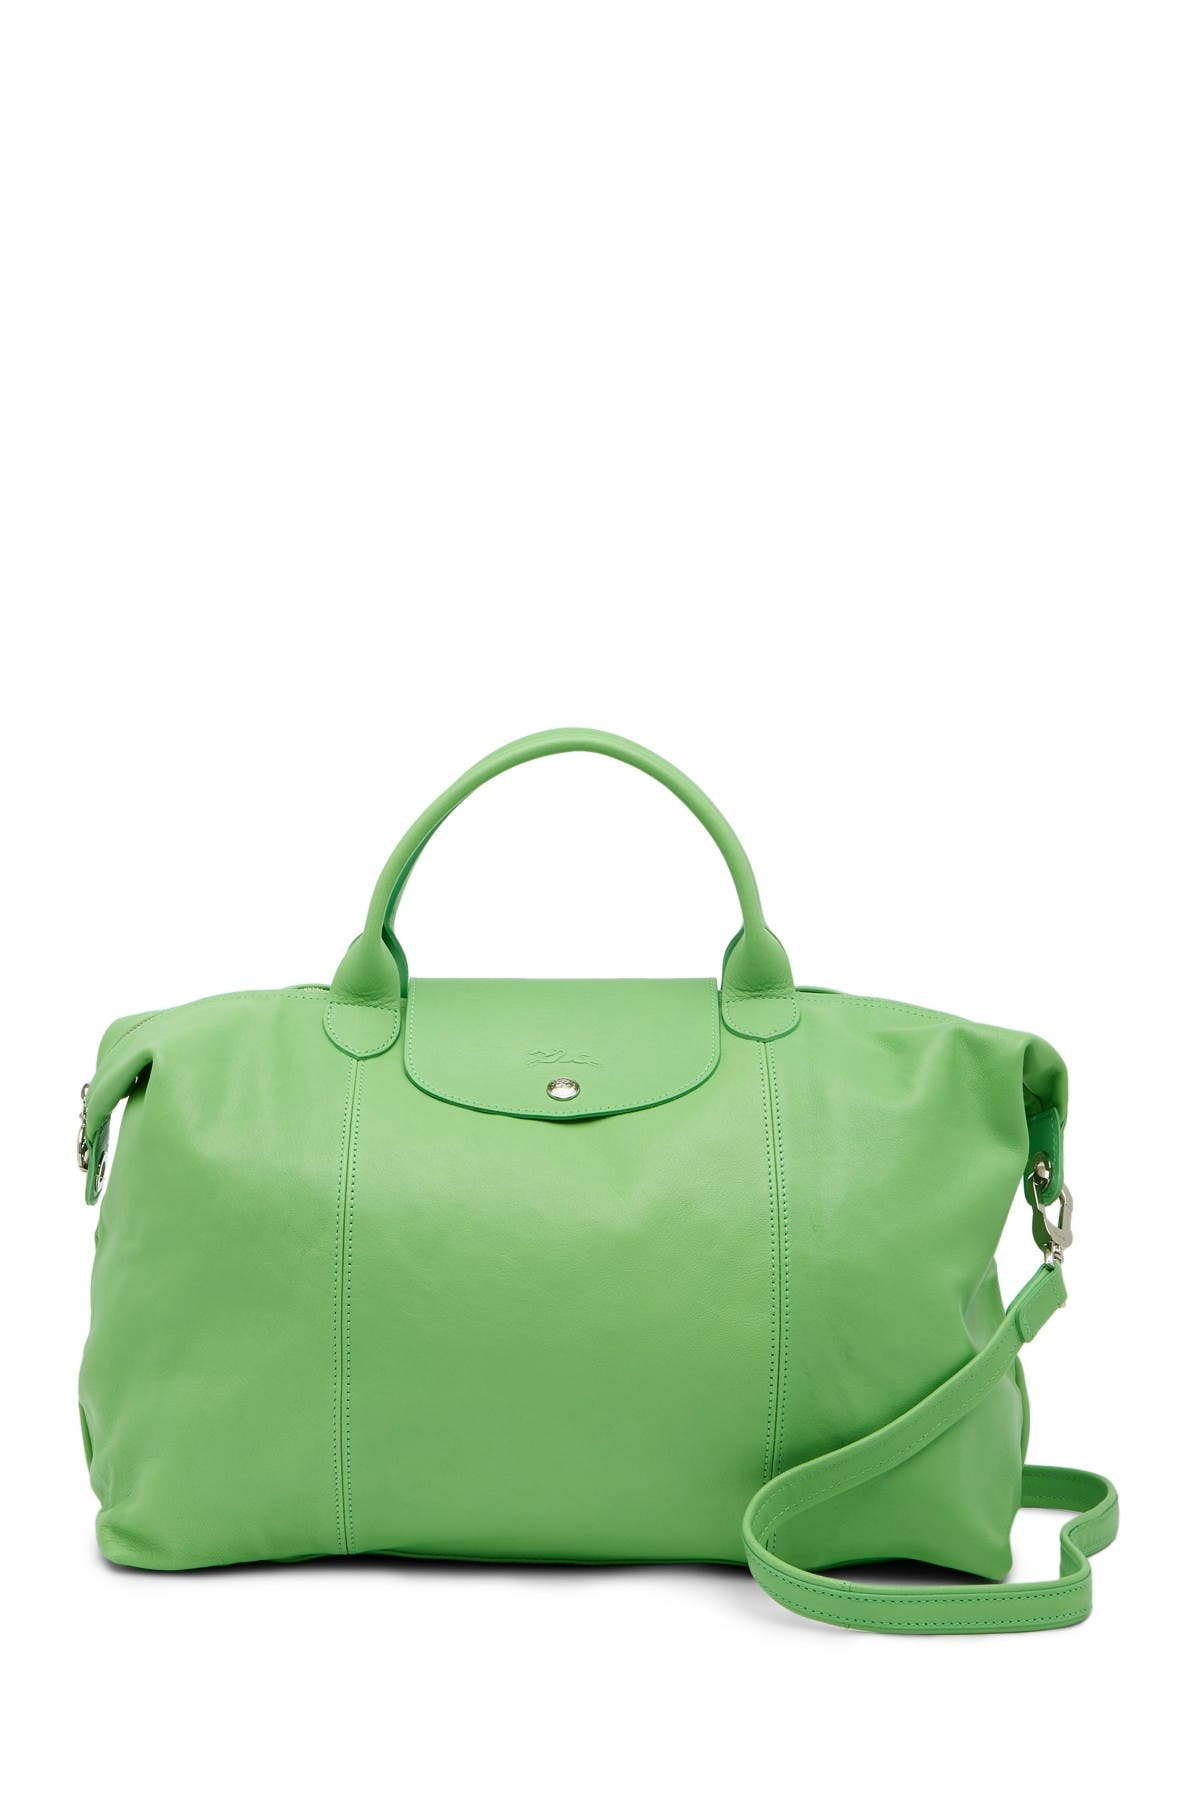 Image of LONGCHAMP Le Pliage Leather Tote Bag